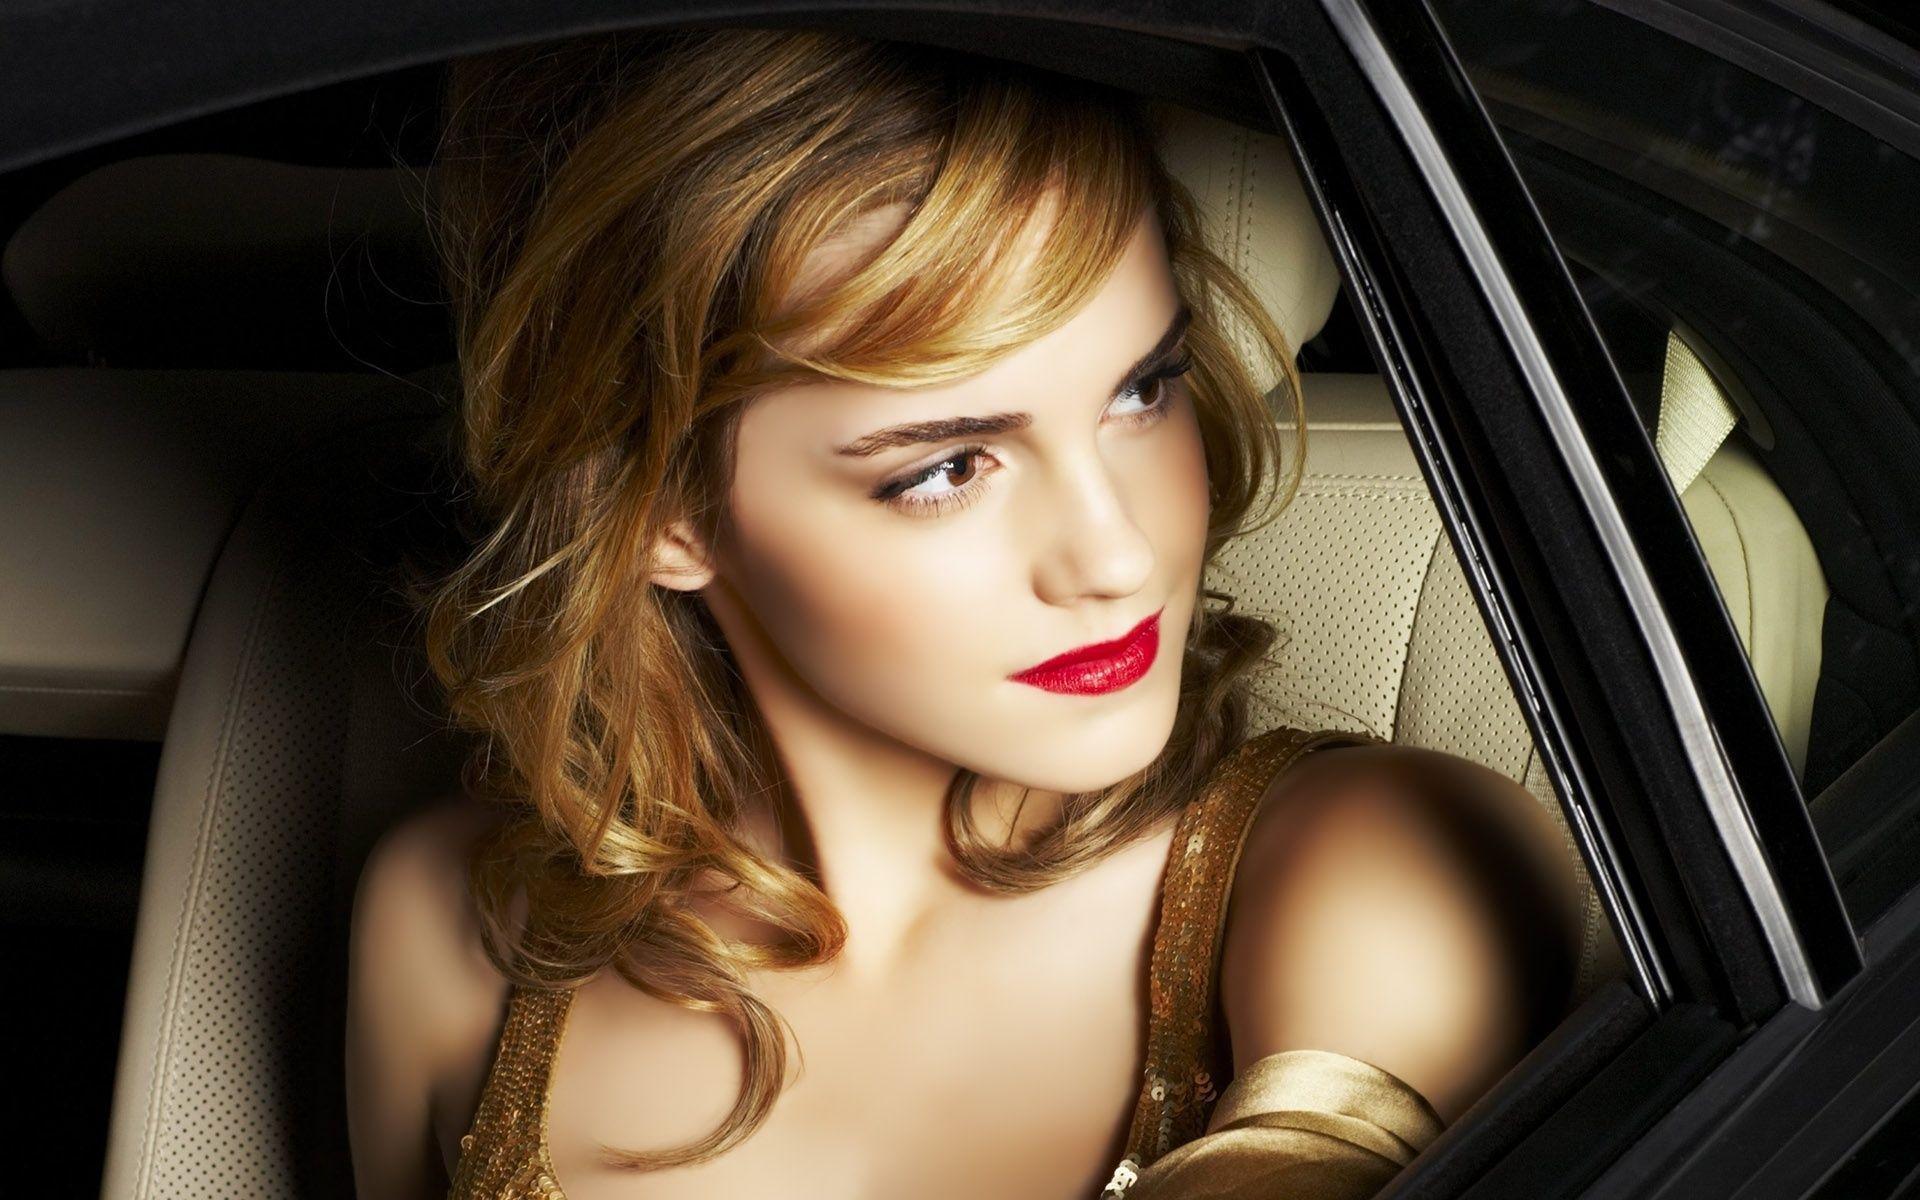 Emma Watson Photoshoot Wallpapers HD Wallpapers r Wallpapers